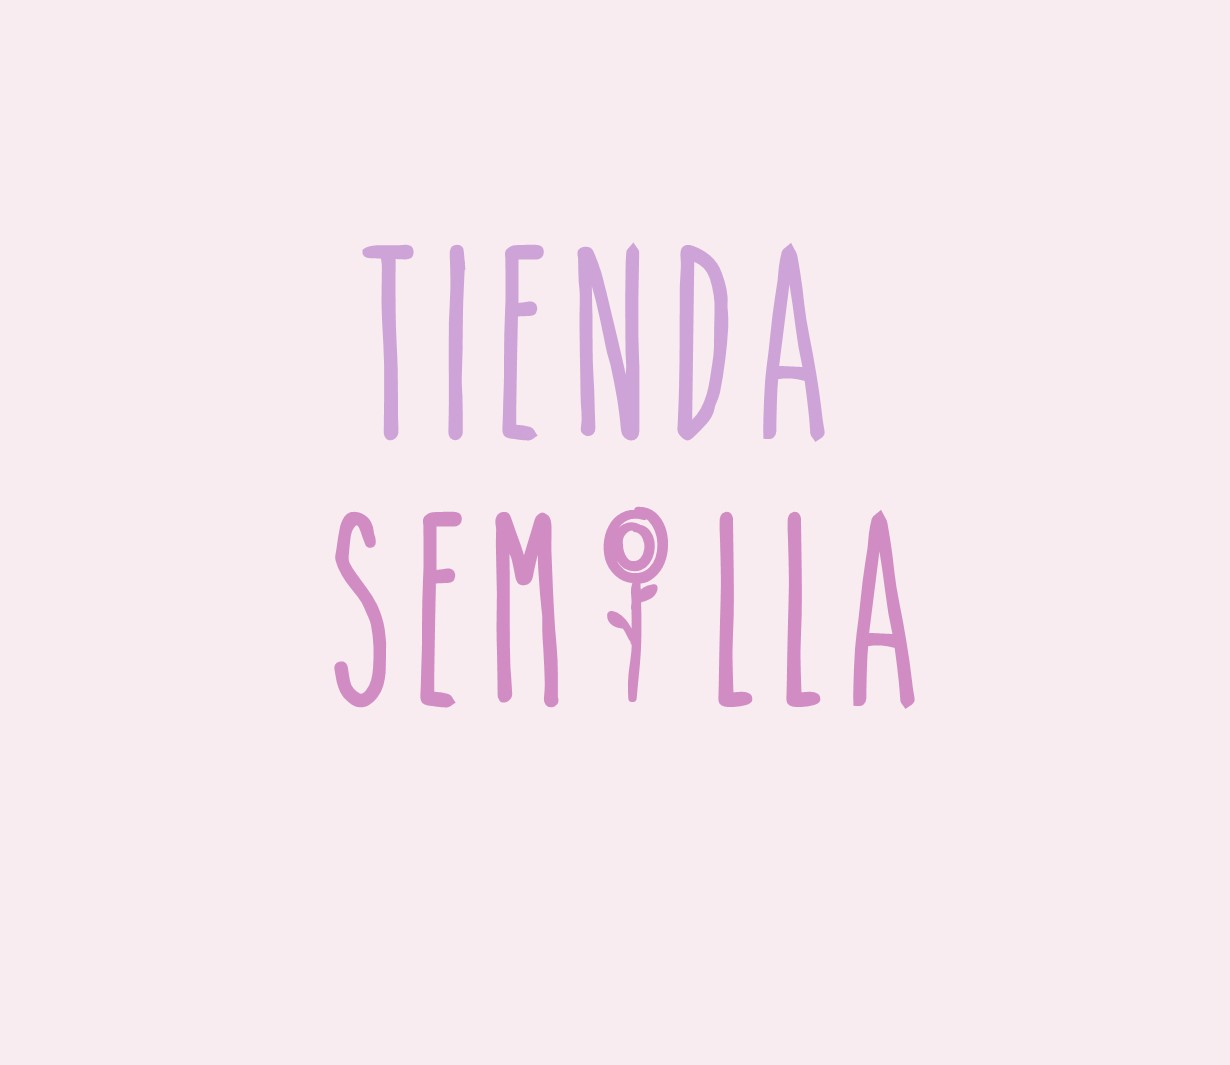 Visitá nuestra maravillosa Tienda Semilla!